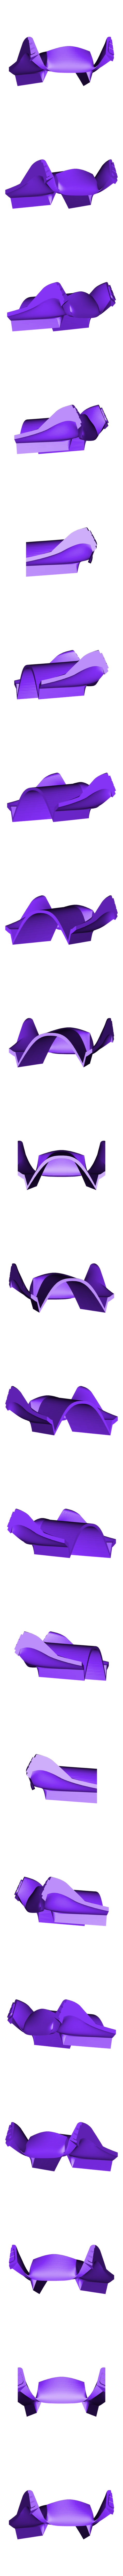 Part_8.stl Download free STL file Tank Trooper Helmet Star Wars Rogue One • 3D printer template, VillainousPropShop